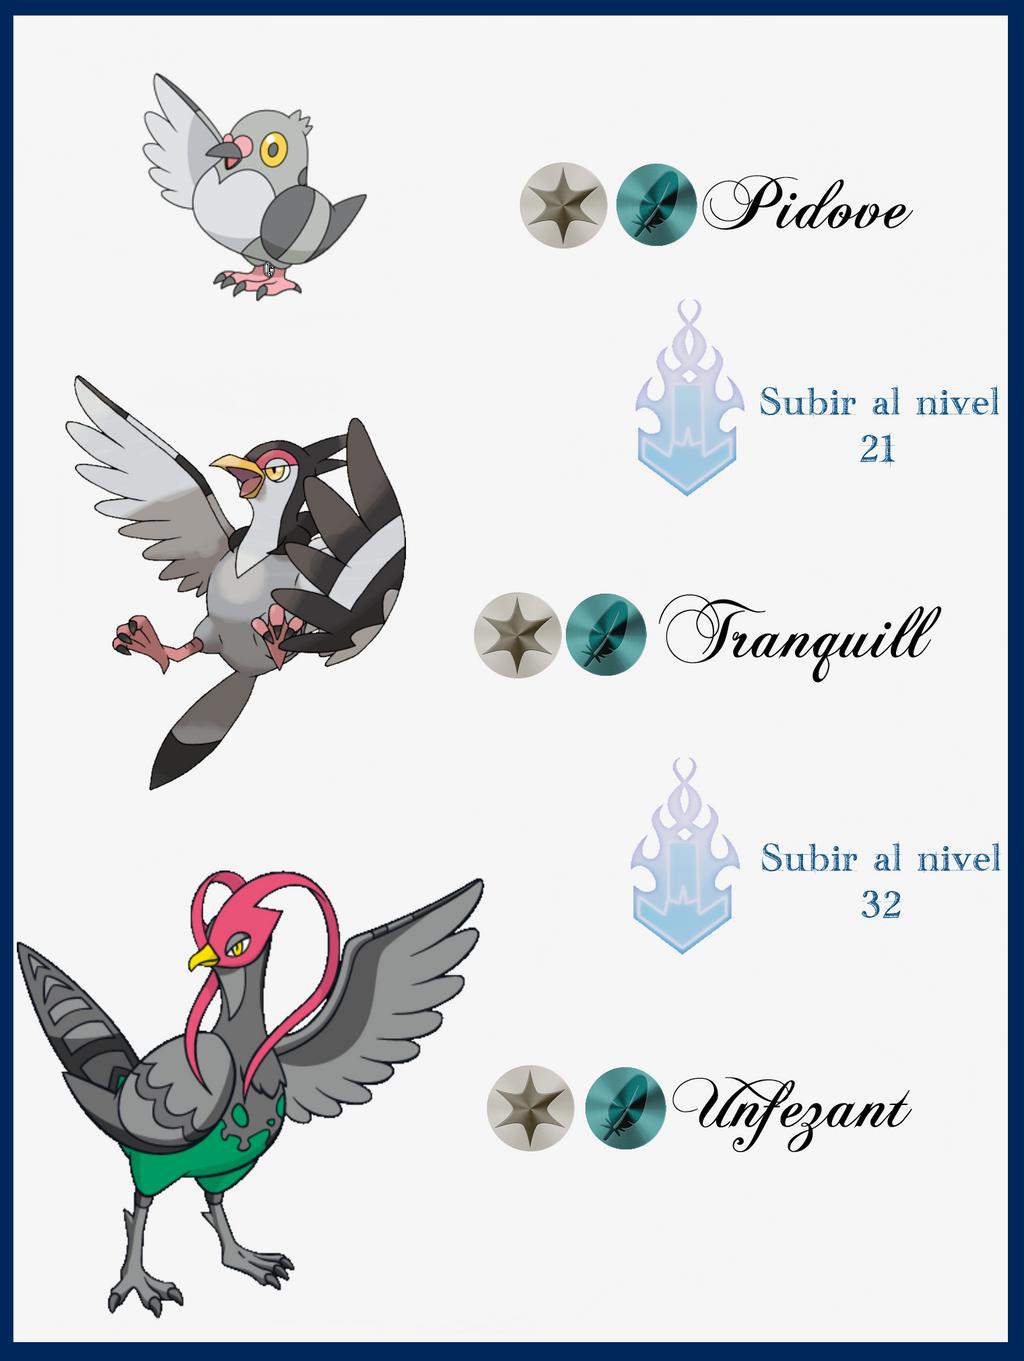 Woobat Evolution Chart 223 Pidove Evol...